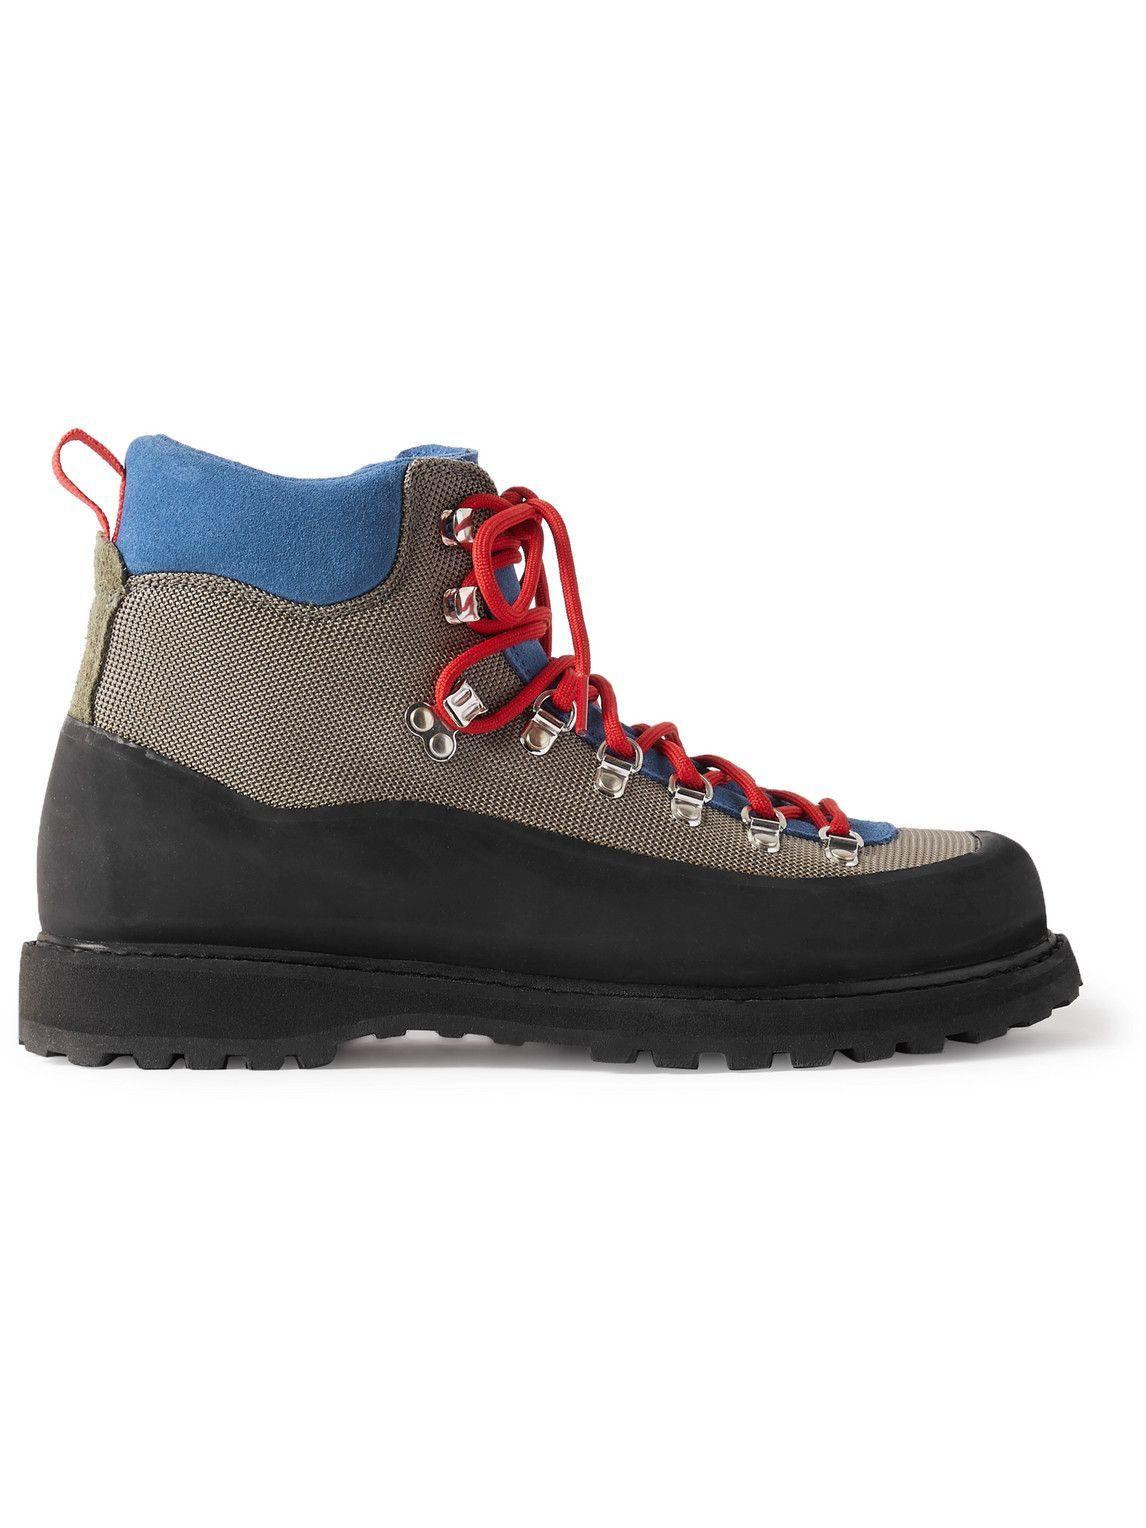 Photo: Diemme - Roccia Vet Rubber-Trimmed Suede and Canvas Boots - Gray